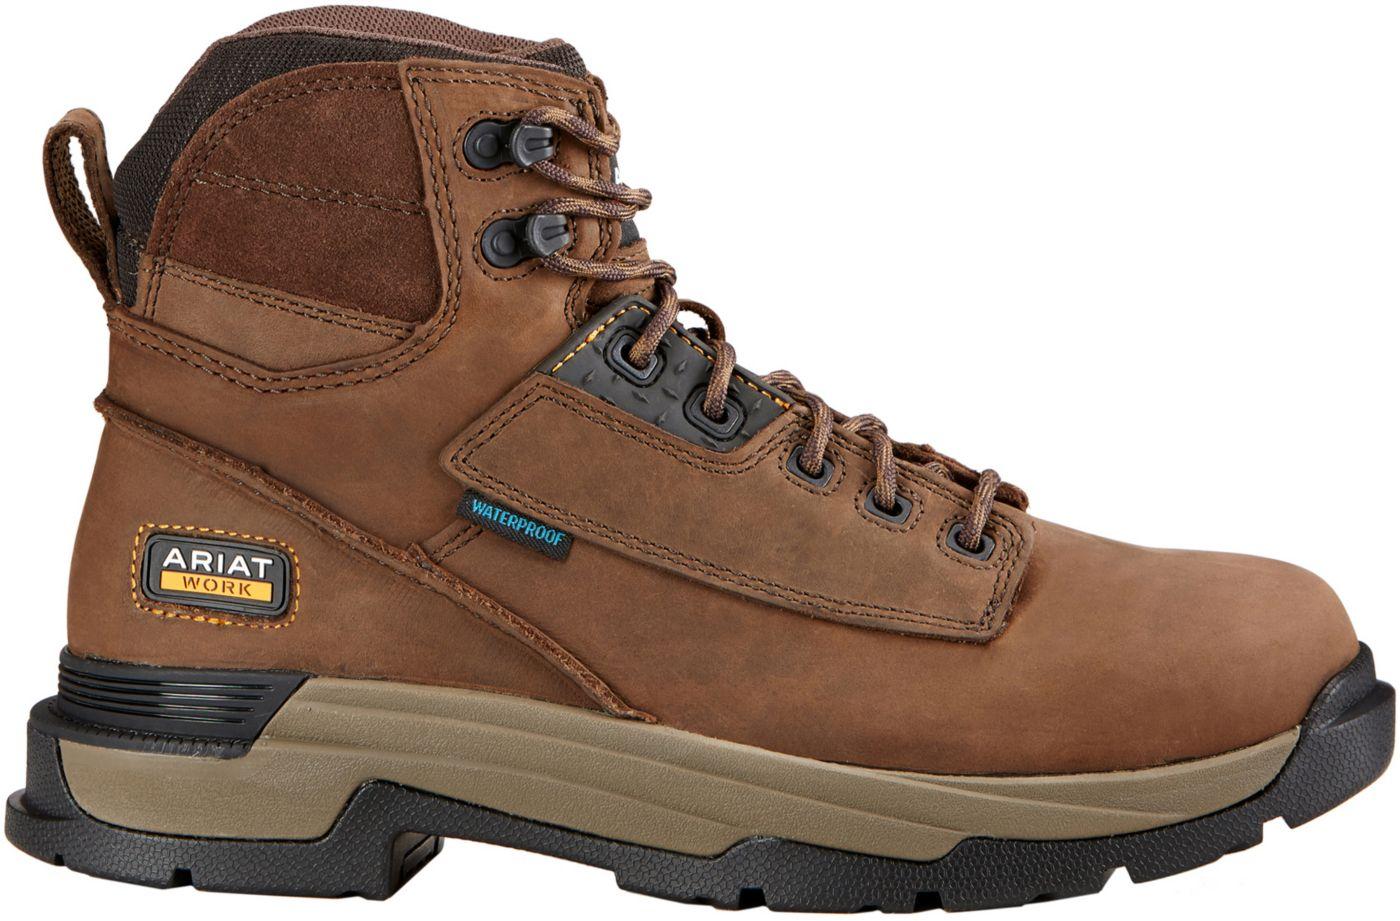 Ariat Men's Mastergrip 6'' H2O Waterproof Work Boots